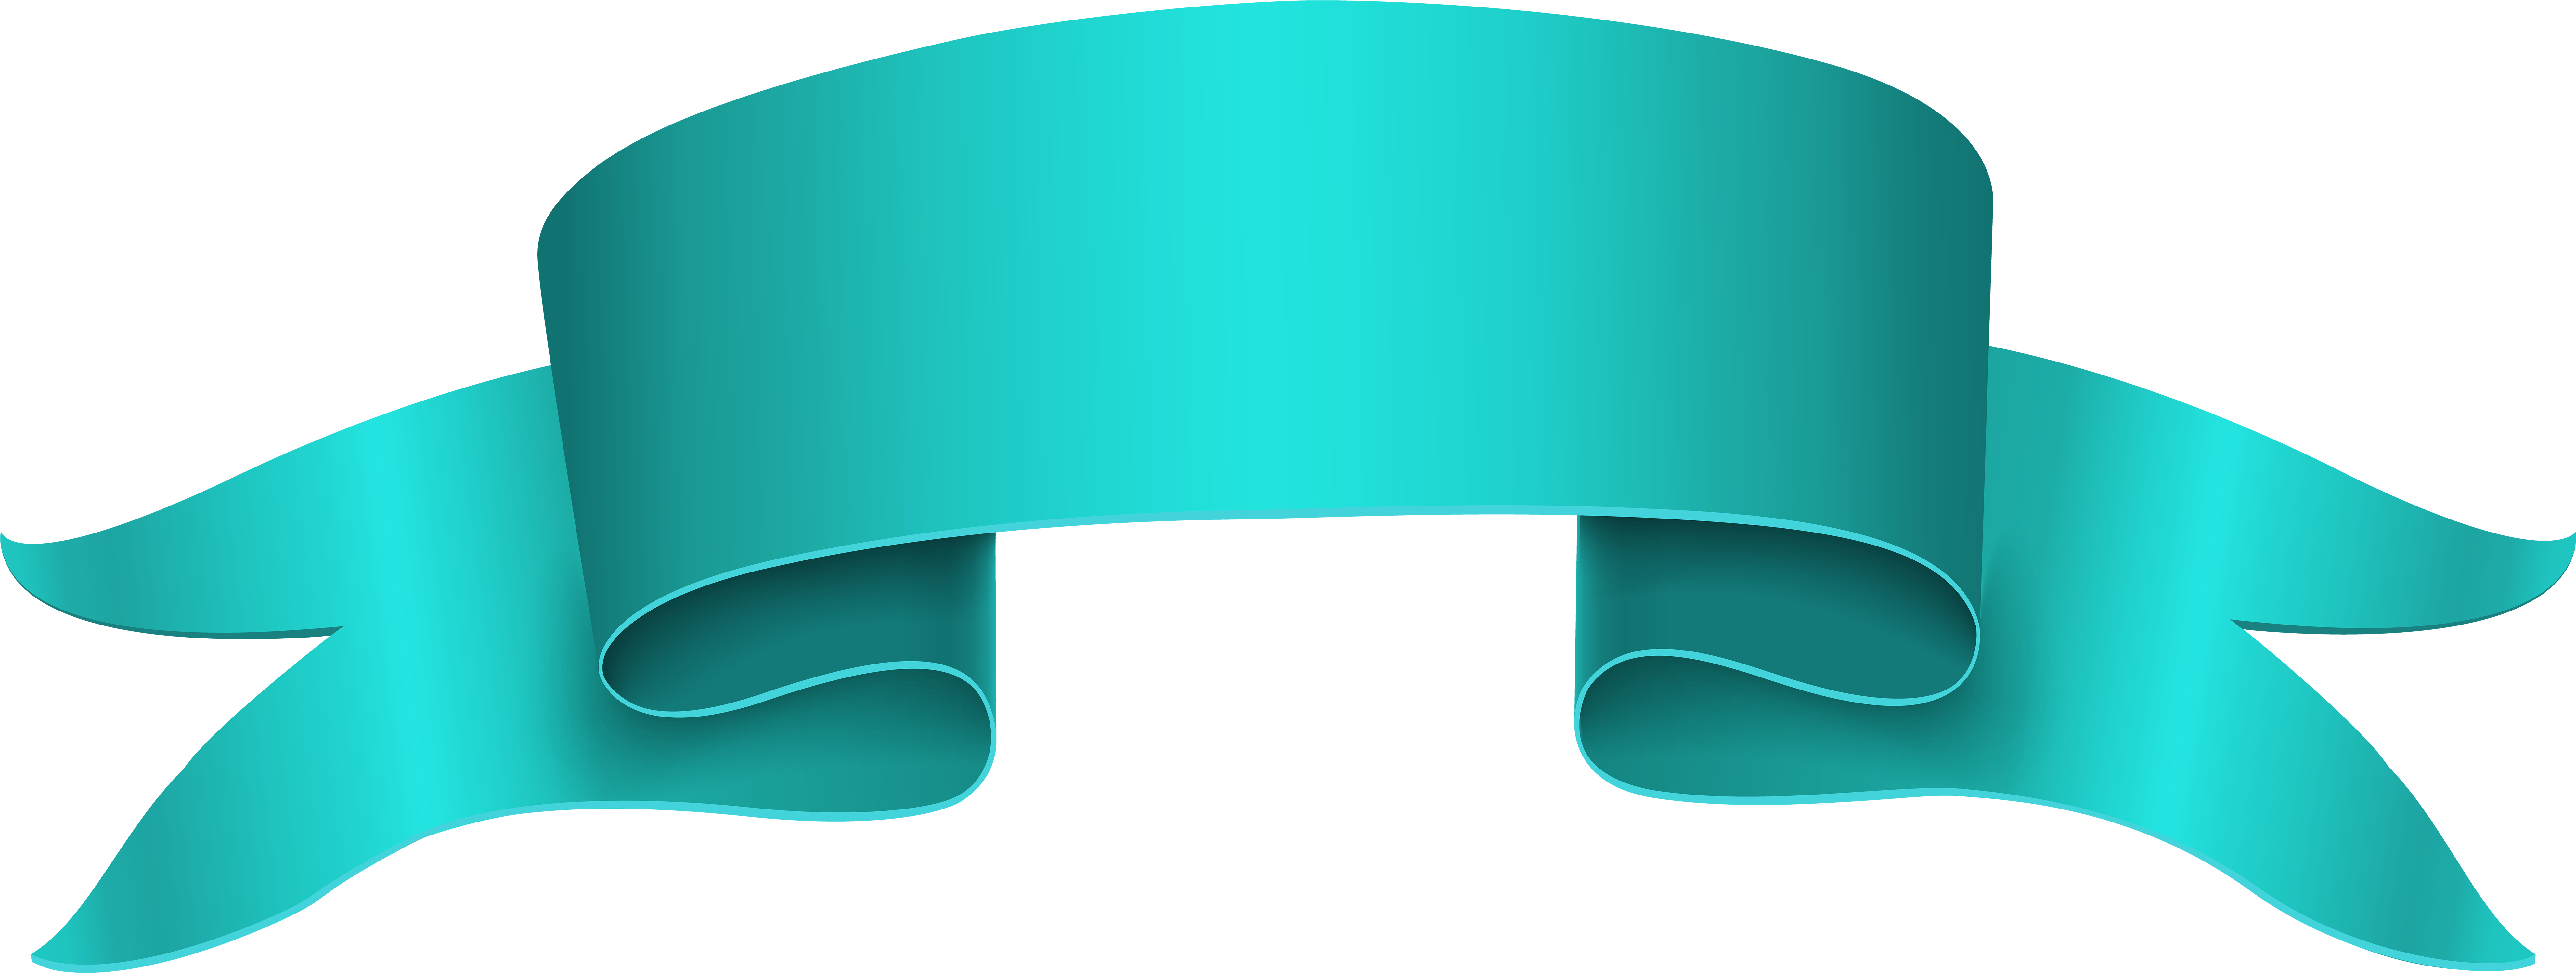 HD Straight Ribbon Banner Png.